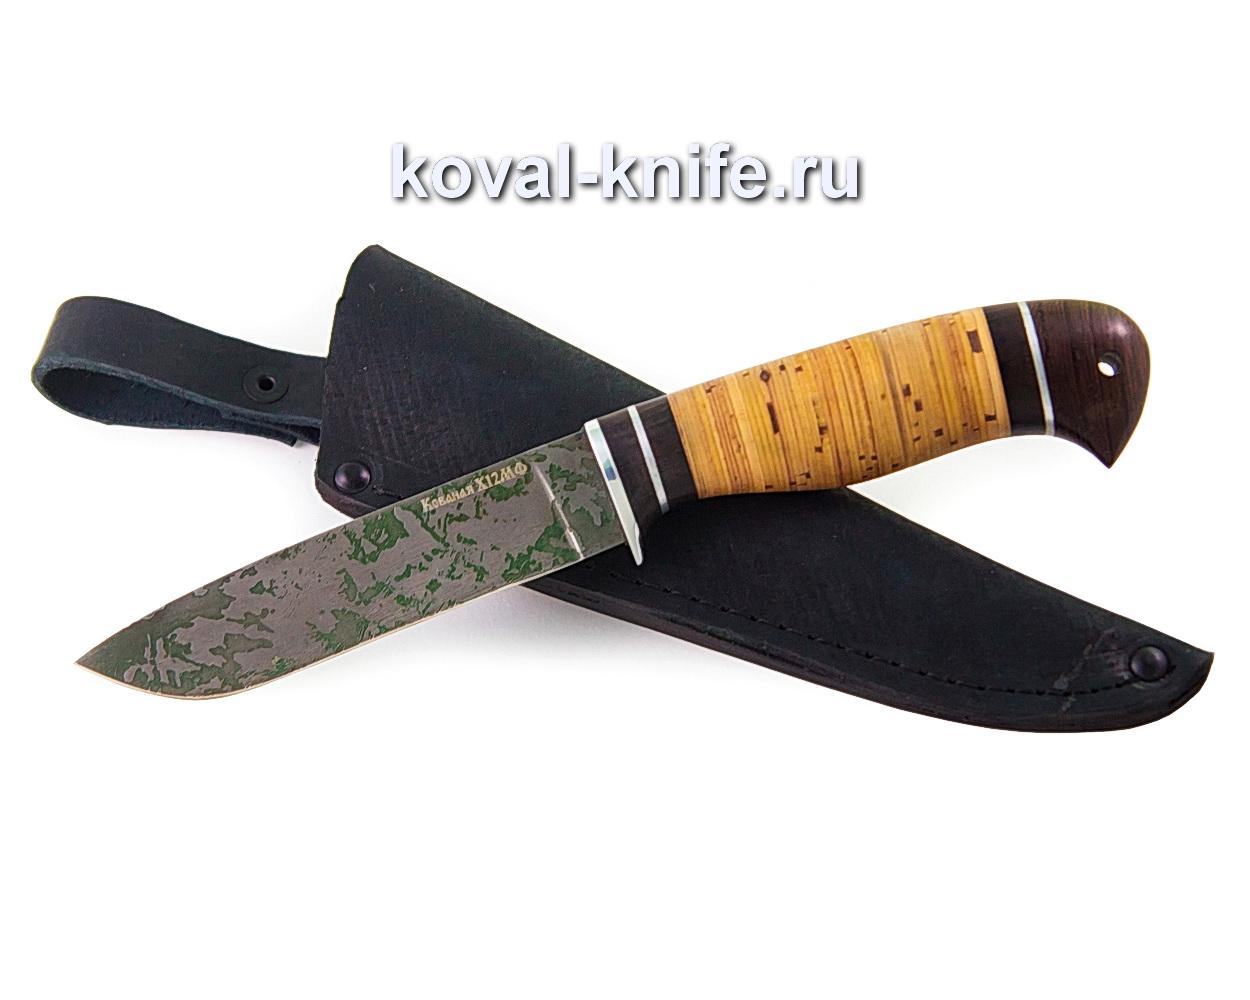 Нож Белка из стали х12мф (рукоять береста, венге) A354